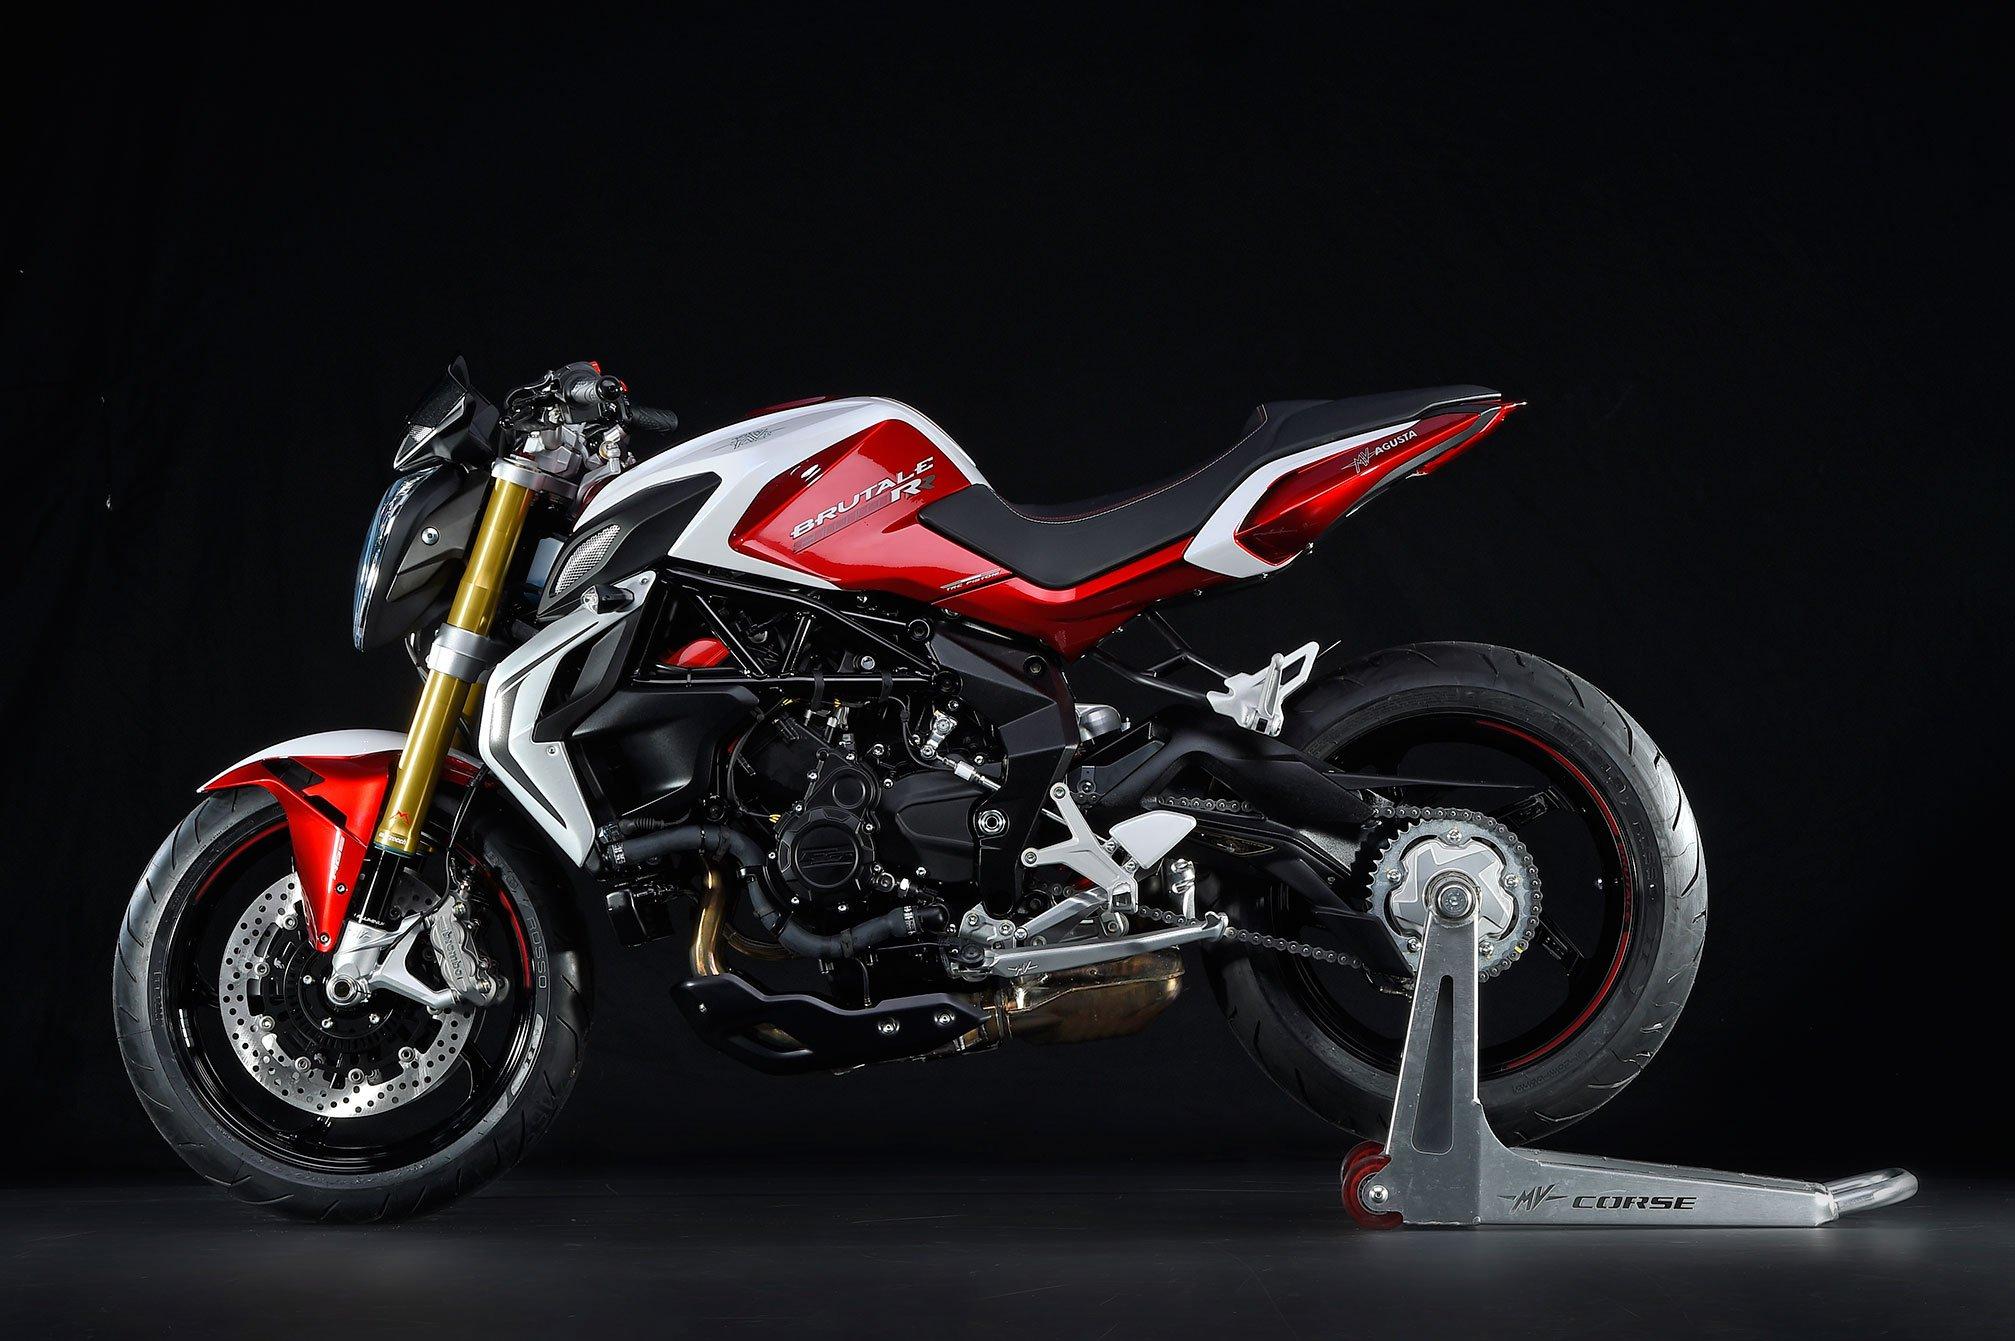 Wallpaper Mv Agusta Brutale 800 2017 Automotive Bikes: 2015 MV-Agusta Brutale 800 R-R Superbike Bike Motorbike